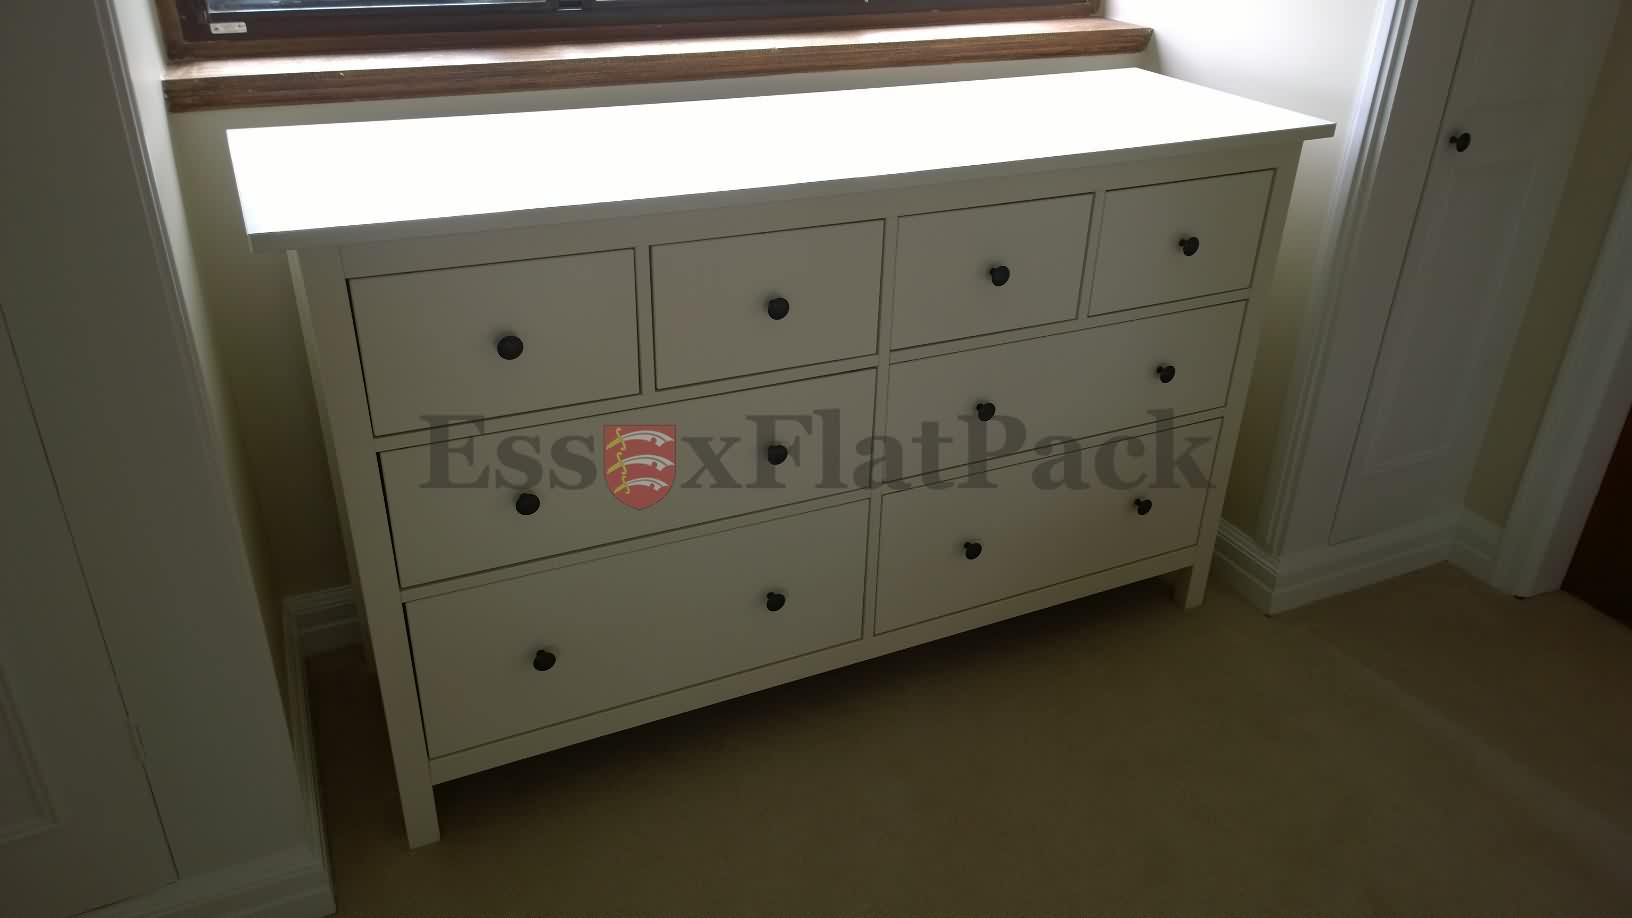 essexflatpack-furniture-20150816135300.jpg